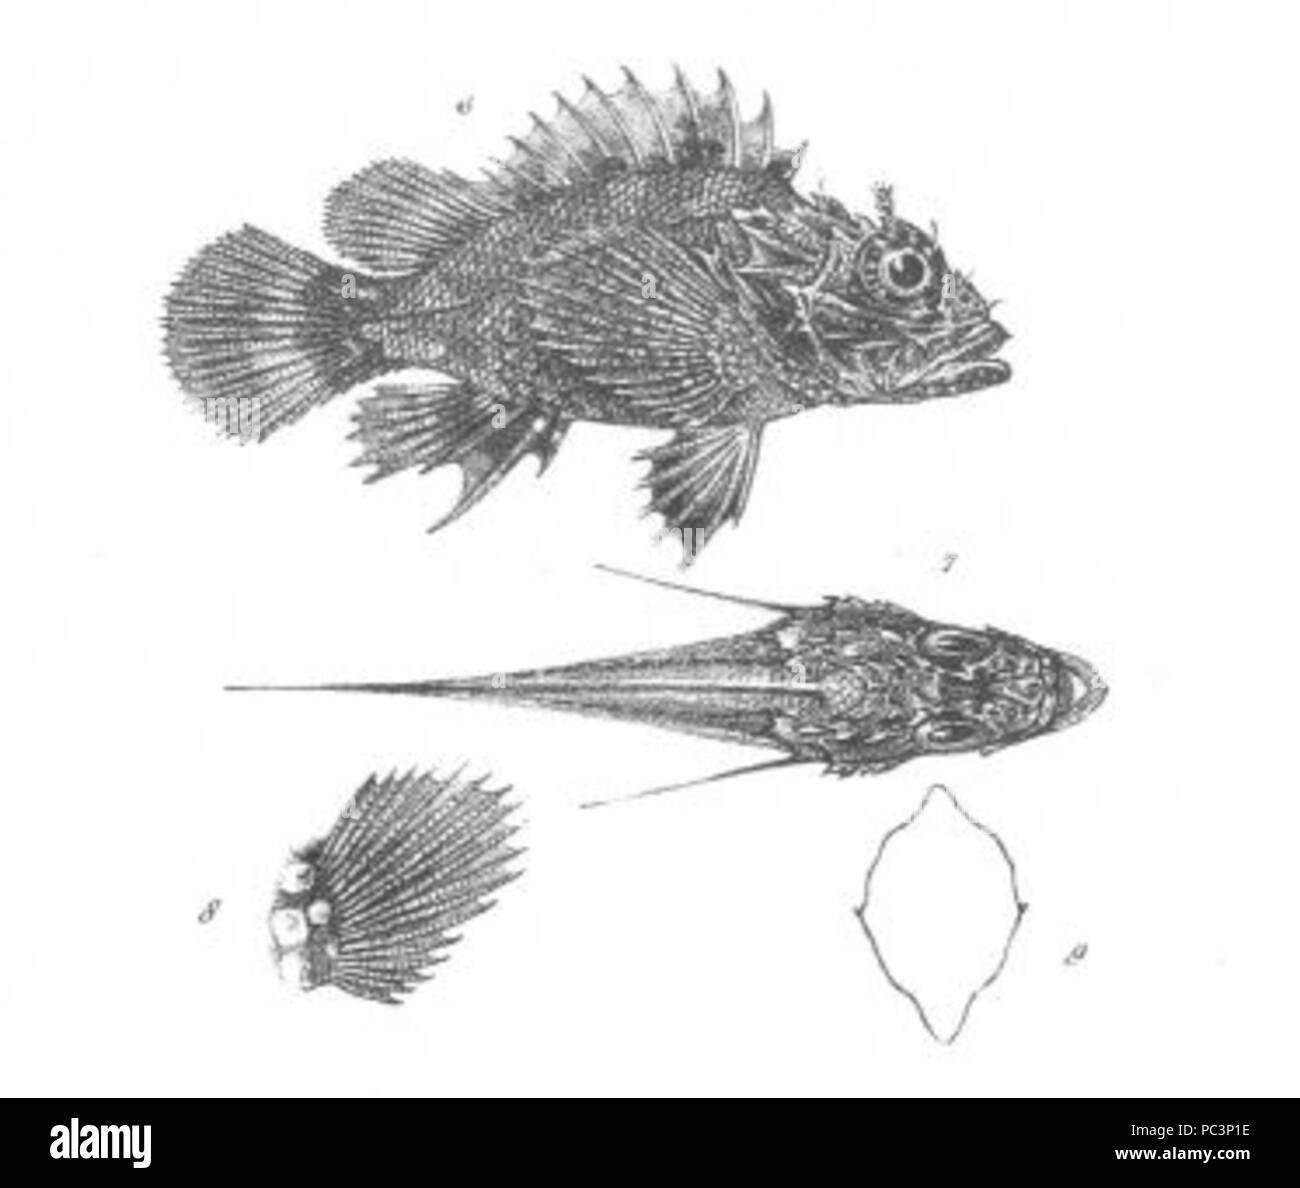 548 Scorpaena Stokesii (Discoveries in Australia) - Stock Image